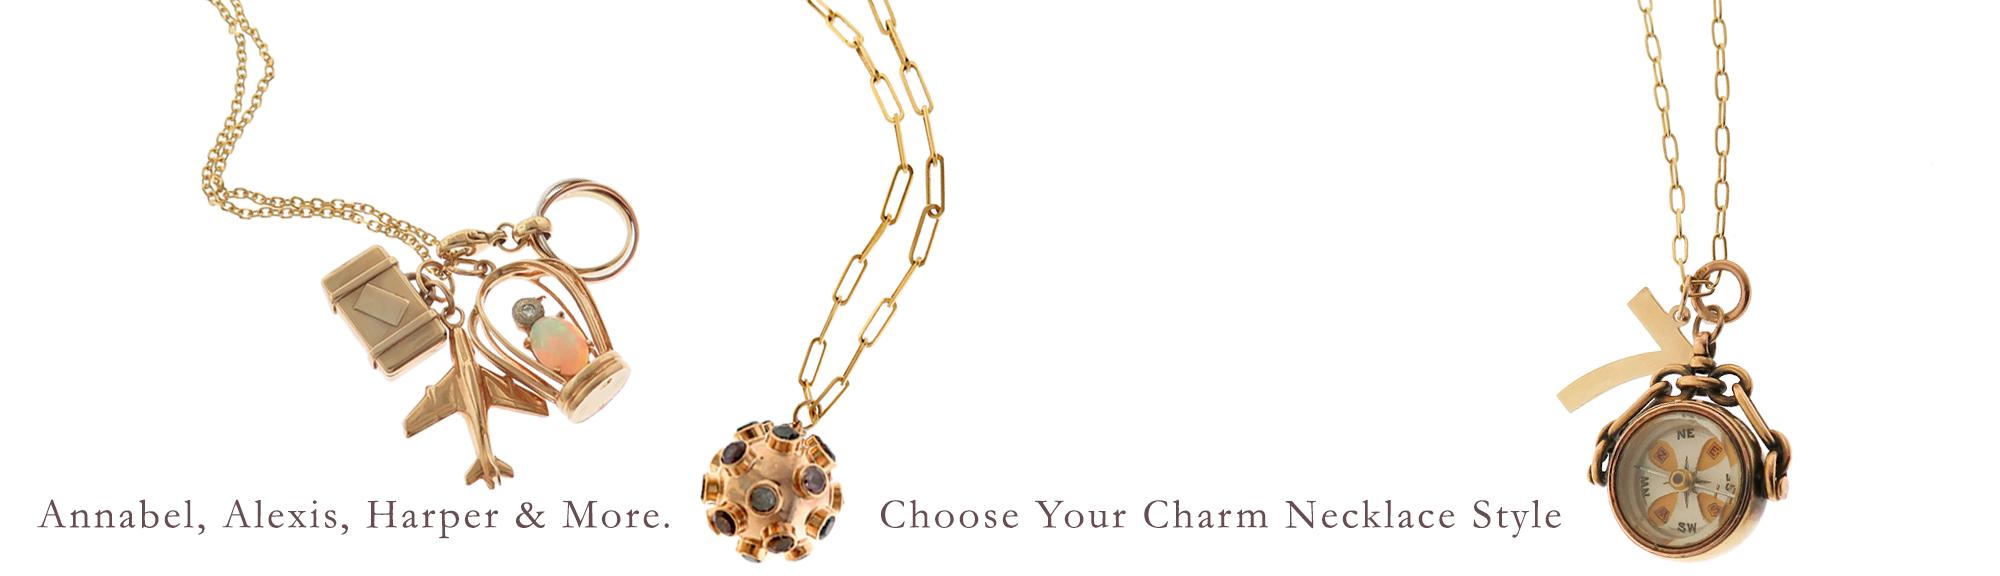 charm necklaces 14k charm